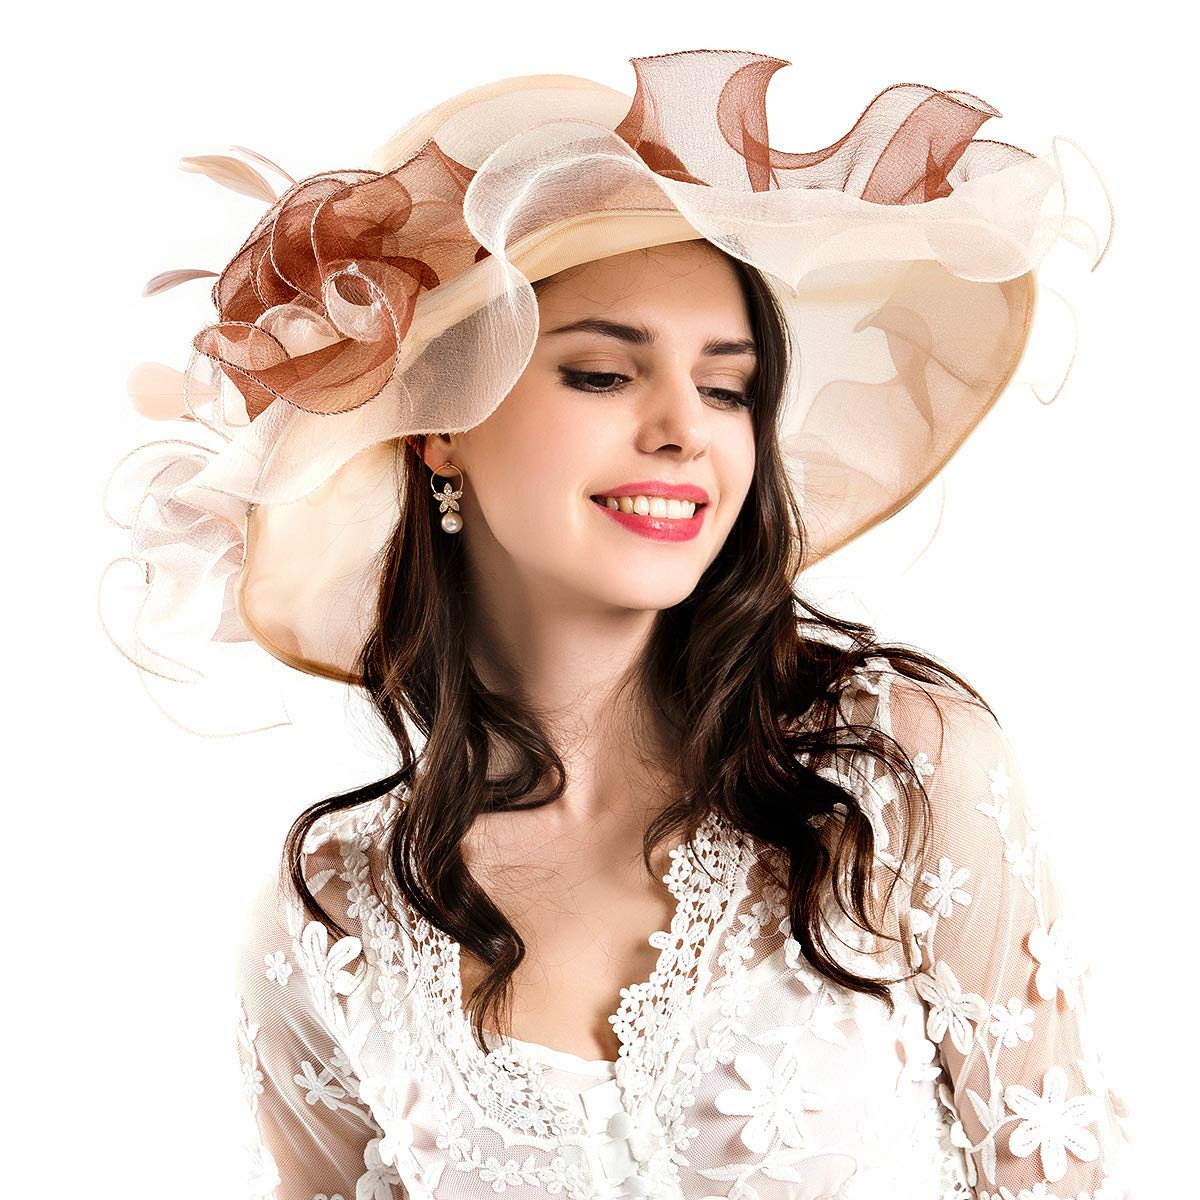 Genuva Women's Organza UV-Anti Church Derby Hat Fascinator Tea Party Wedding Hat Ruffles Wide Brim Bridal Cap (Style 3 - Beige) by Genuva